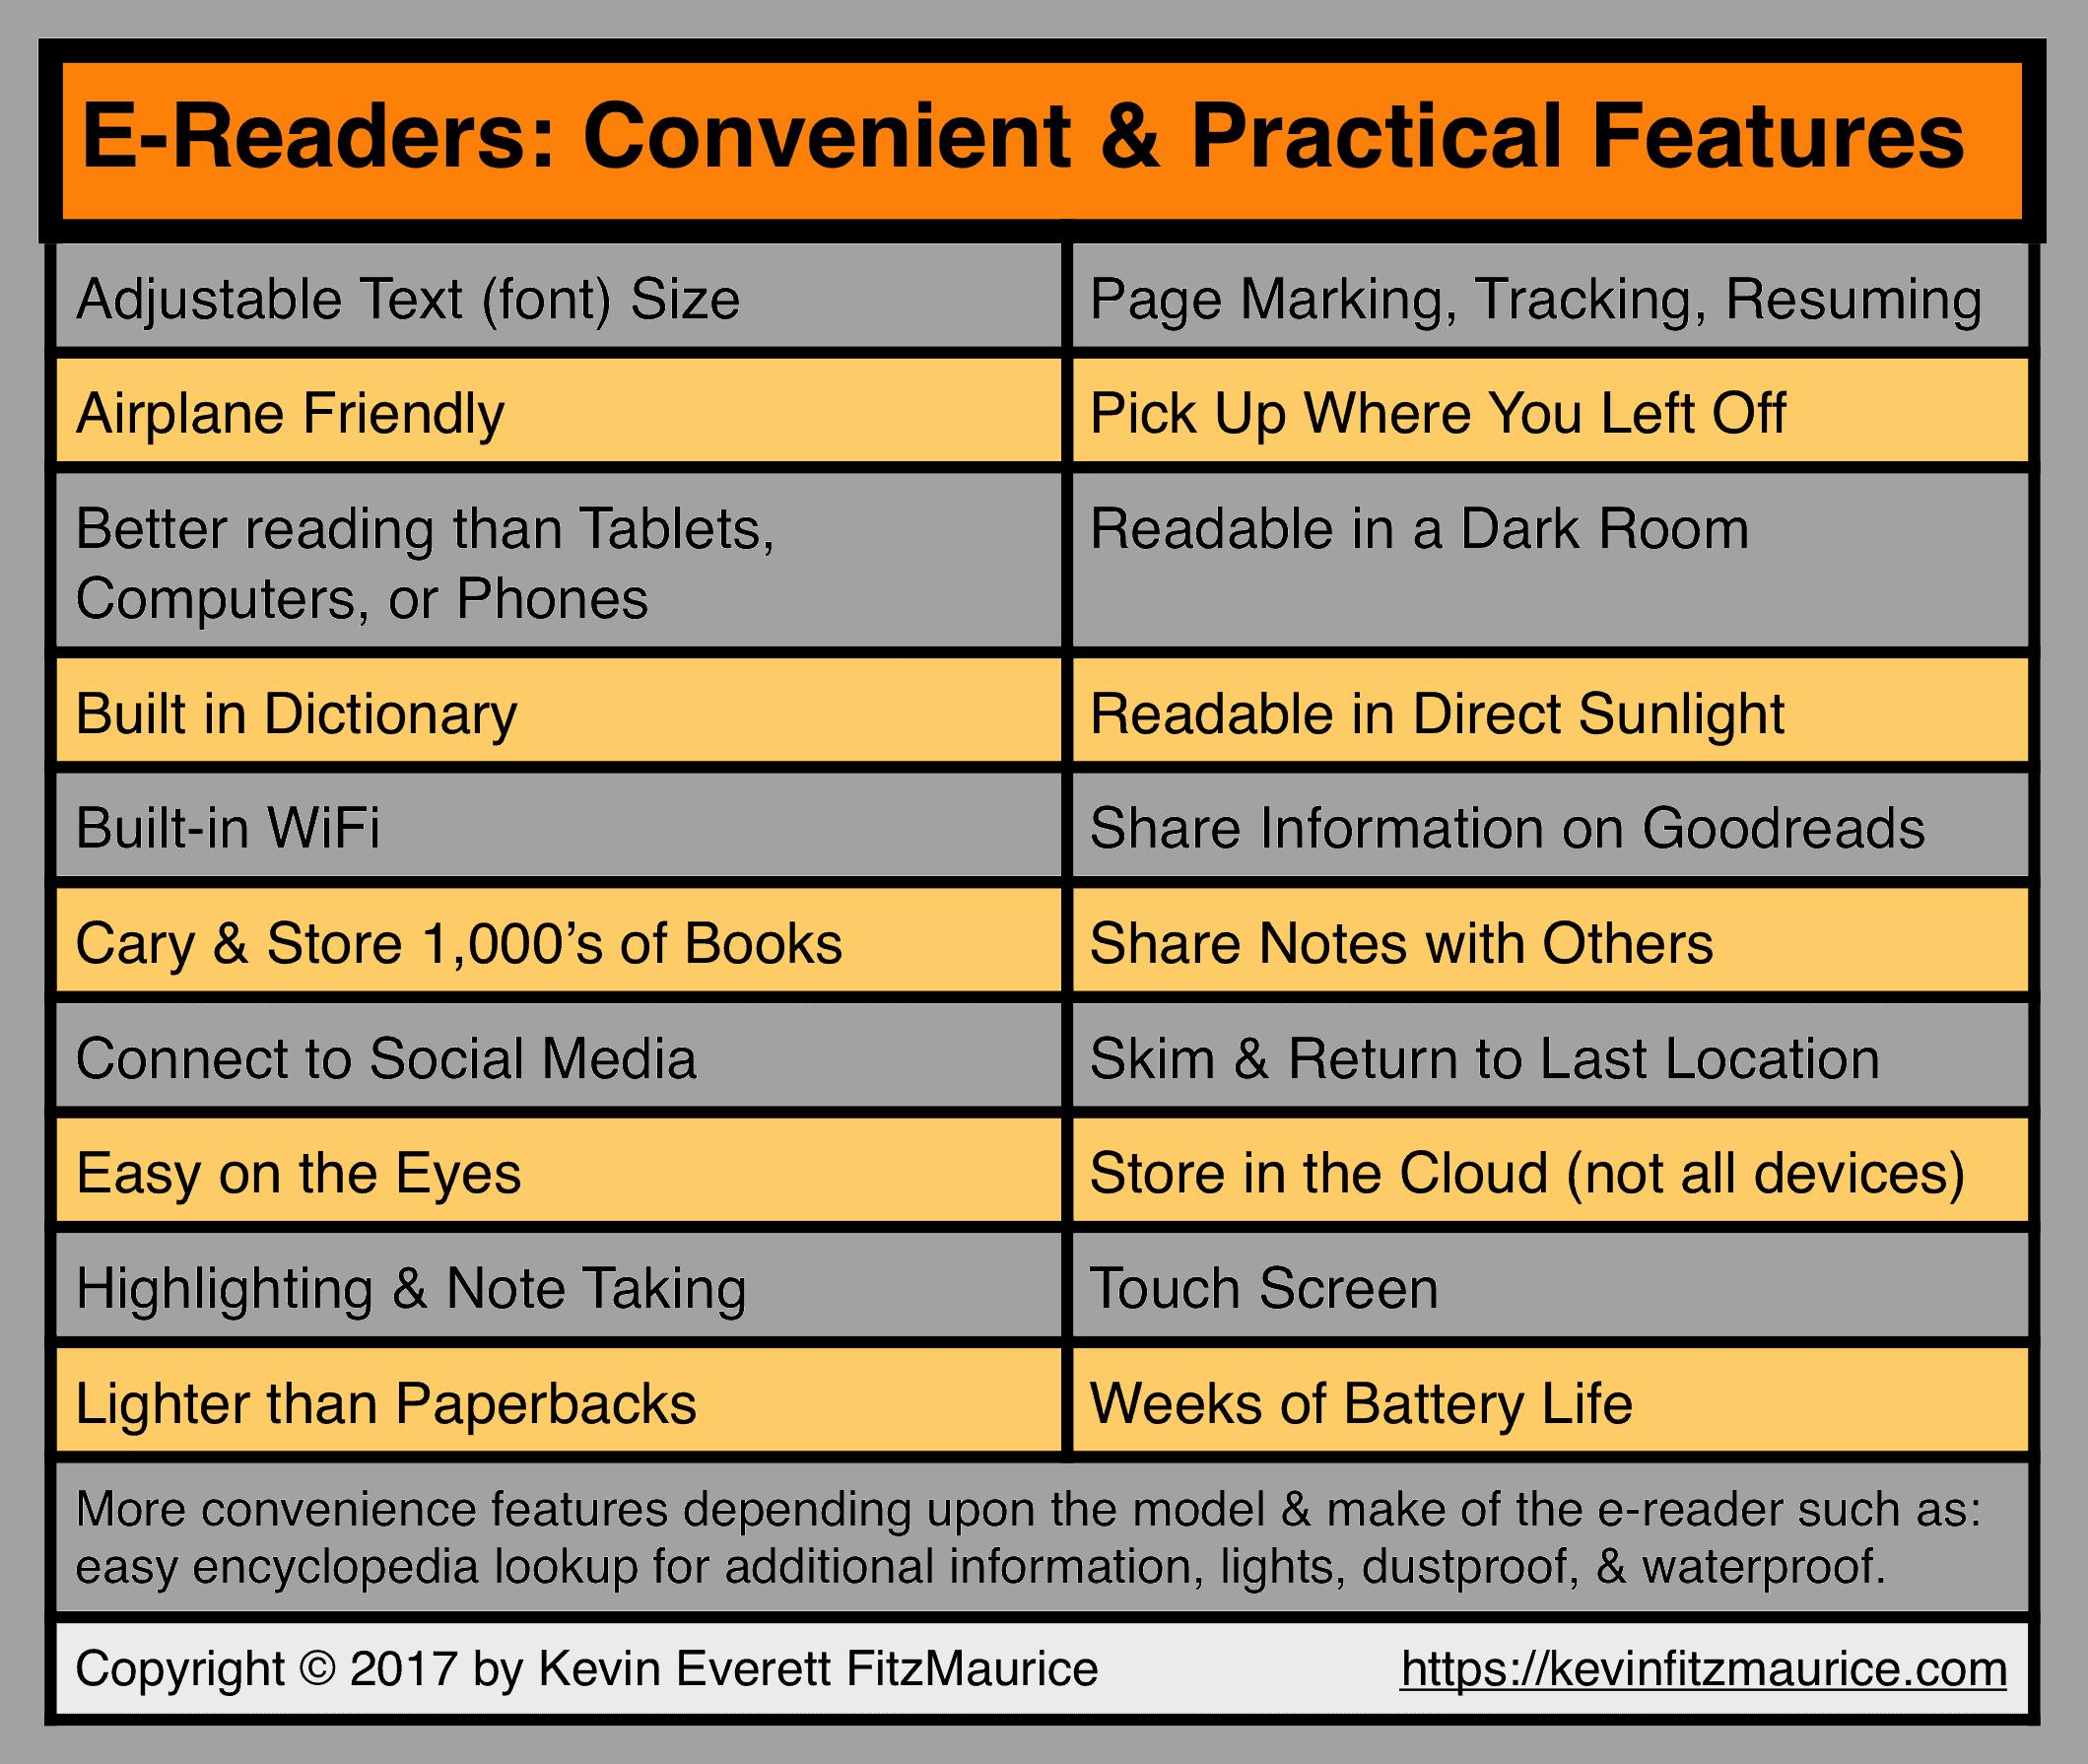 E-Readers Are Convenient & Practical